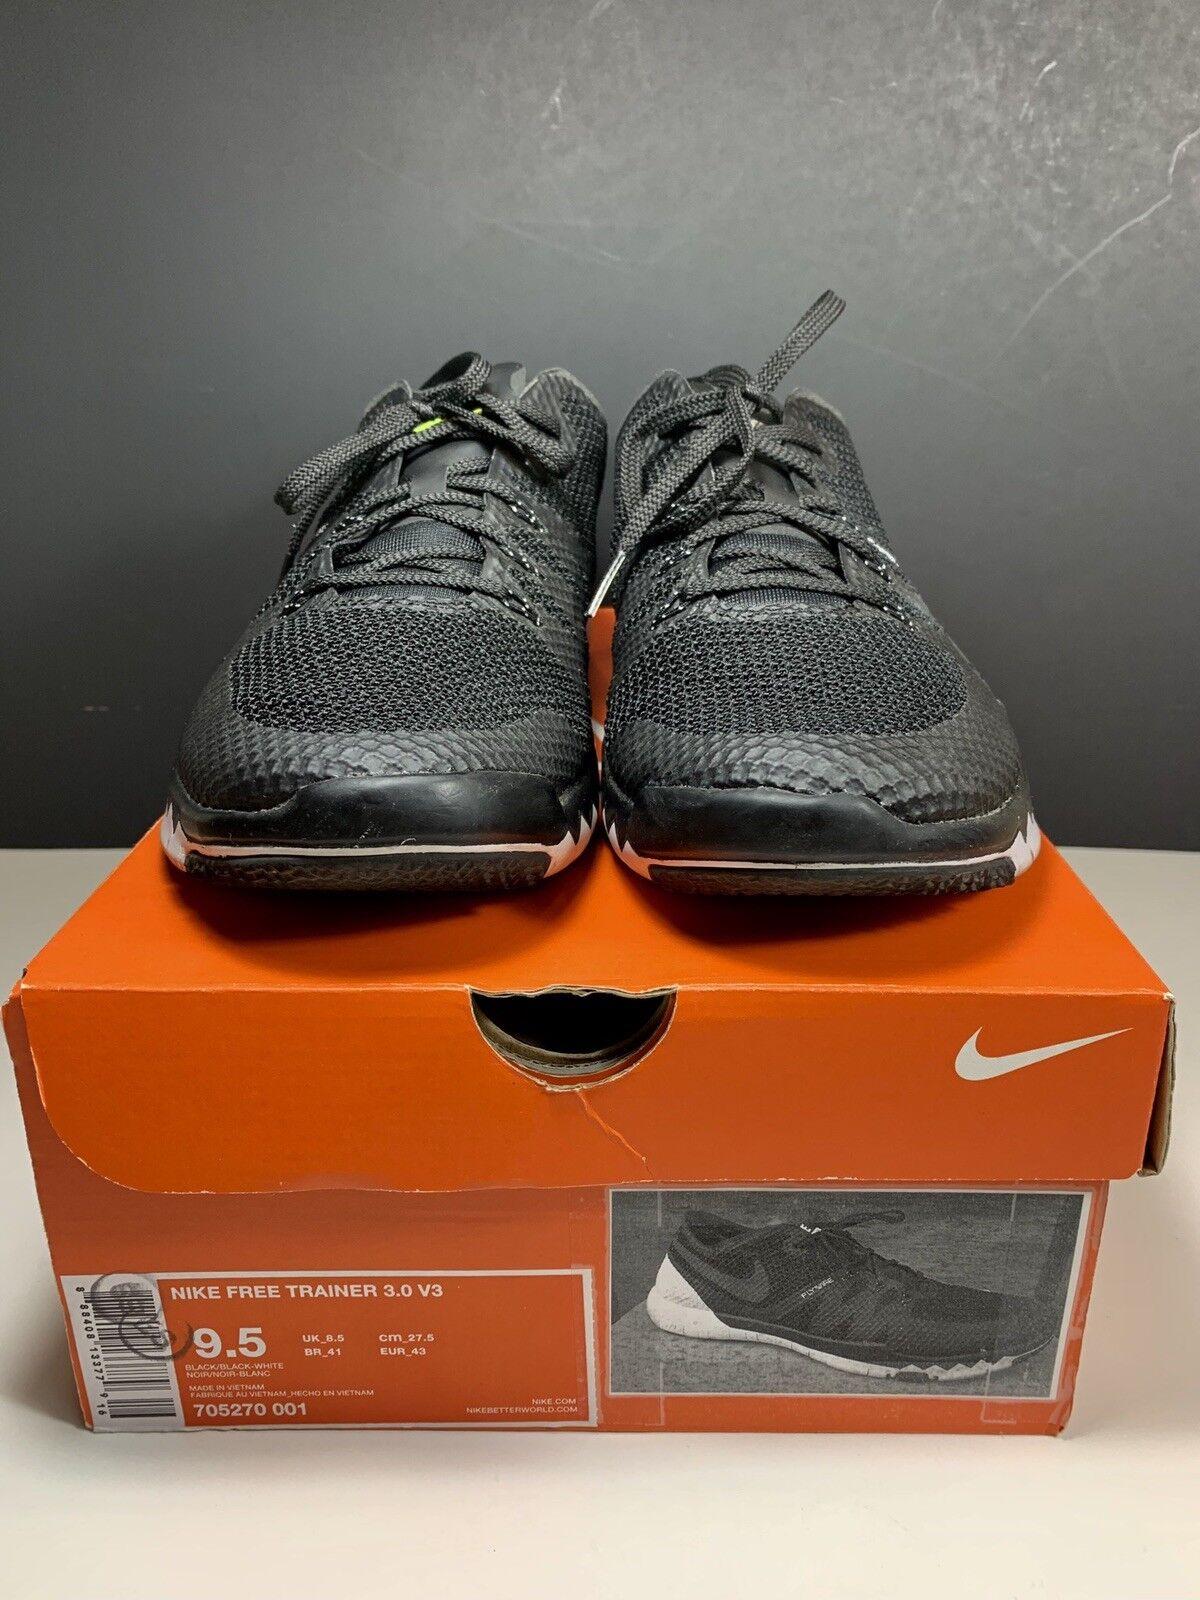 Mens Nike Free Trainer 3.0 V3 Size 9.5 (705270-001)